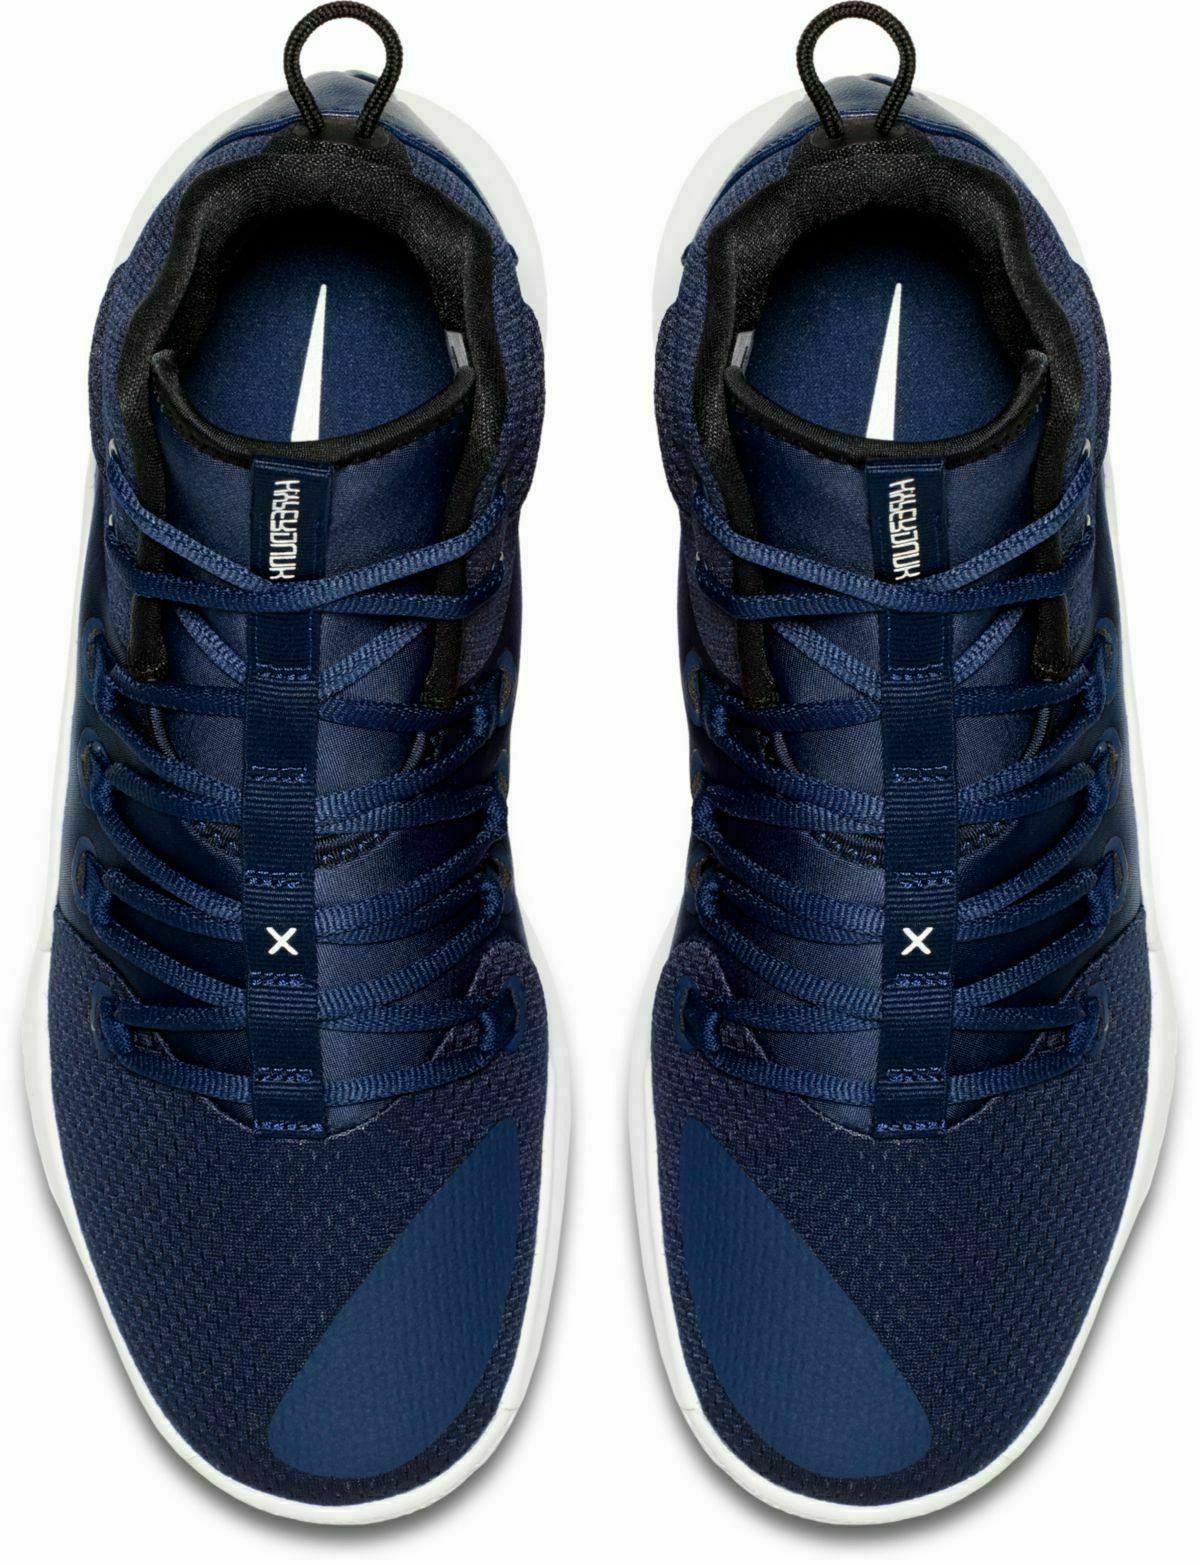 Nike Hyperdunk X Men's Navy/Black